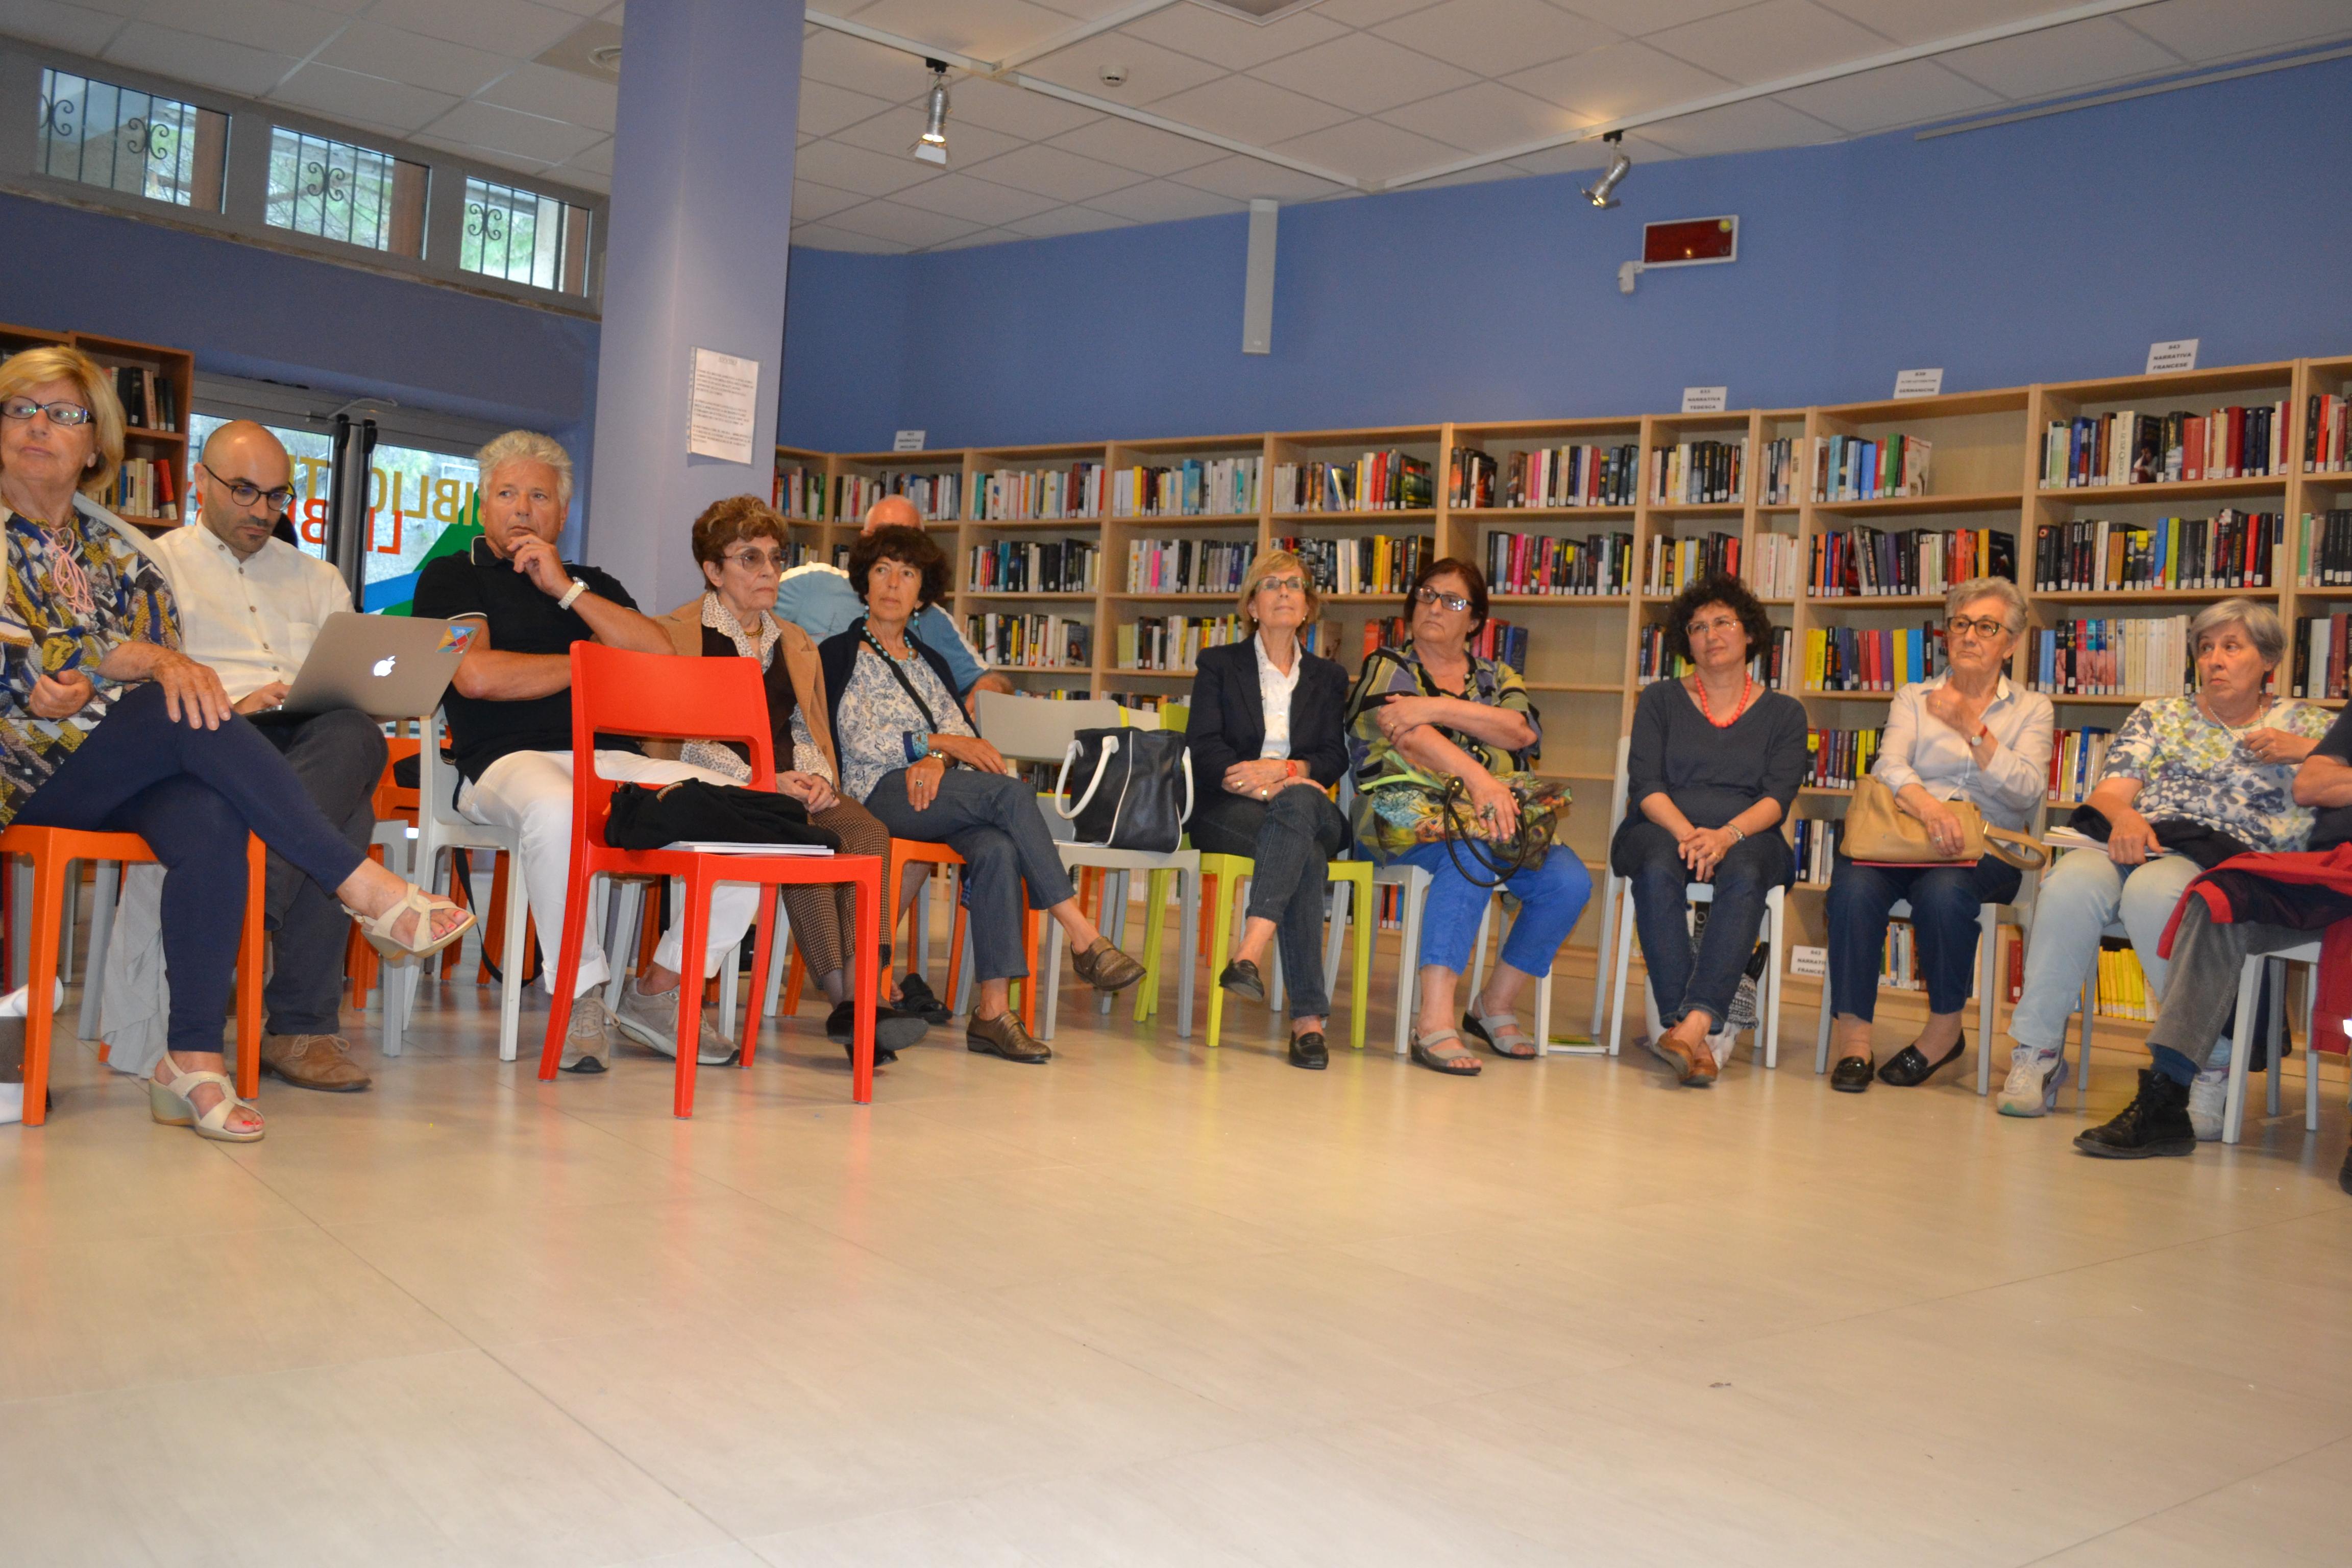 Focus group - 14